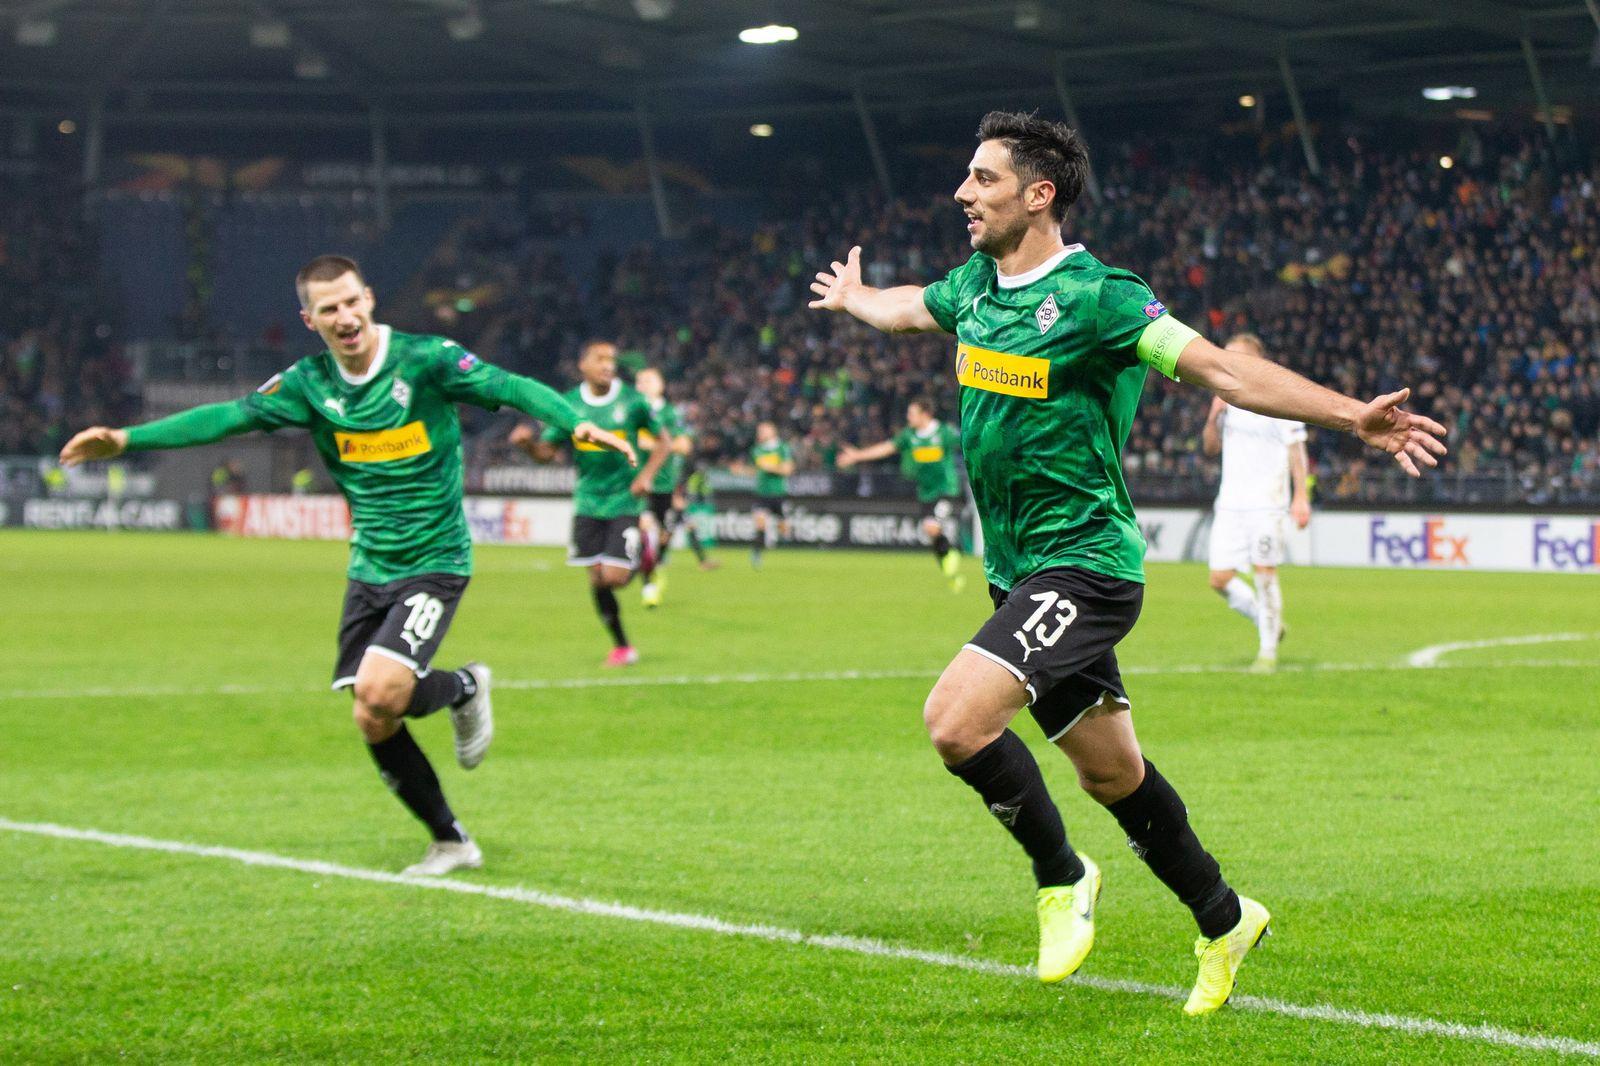 Wolfsberger AC - Borussia Mönchengladbach